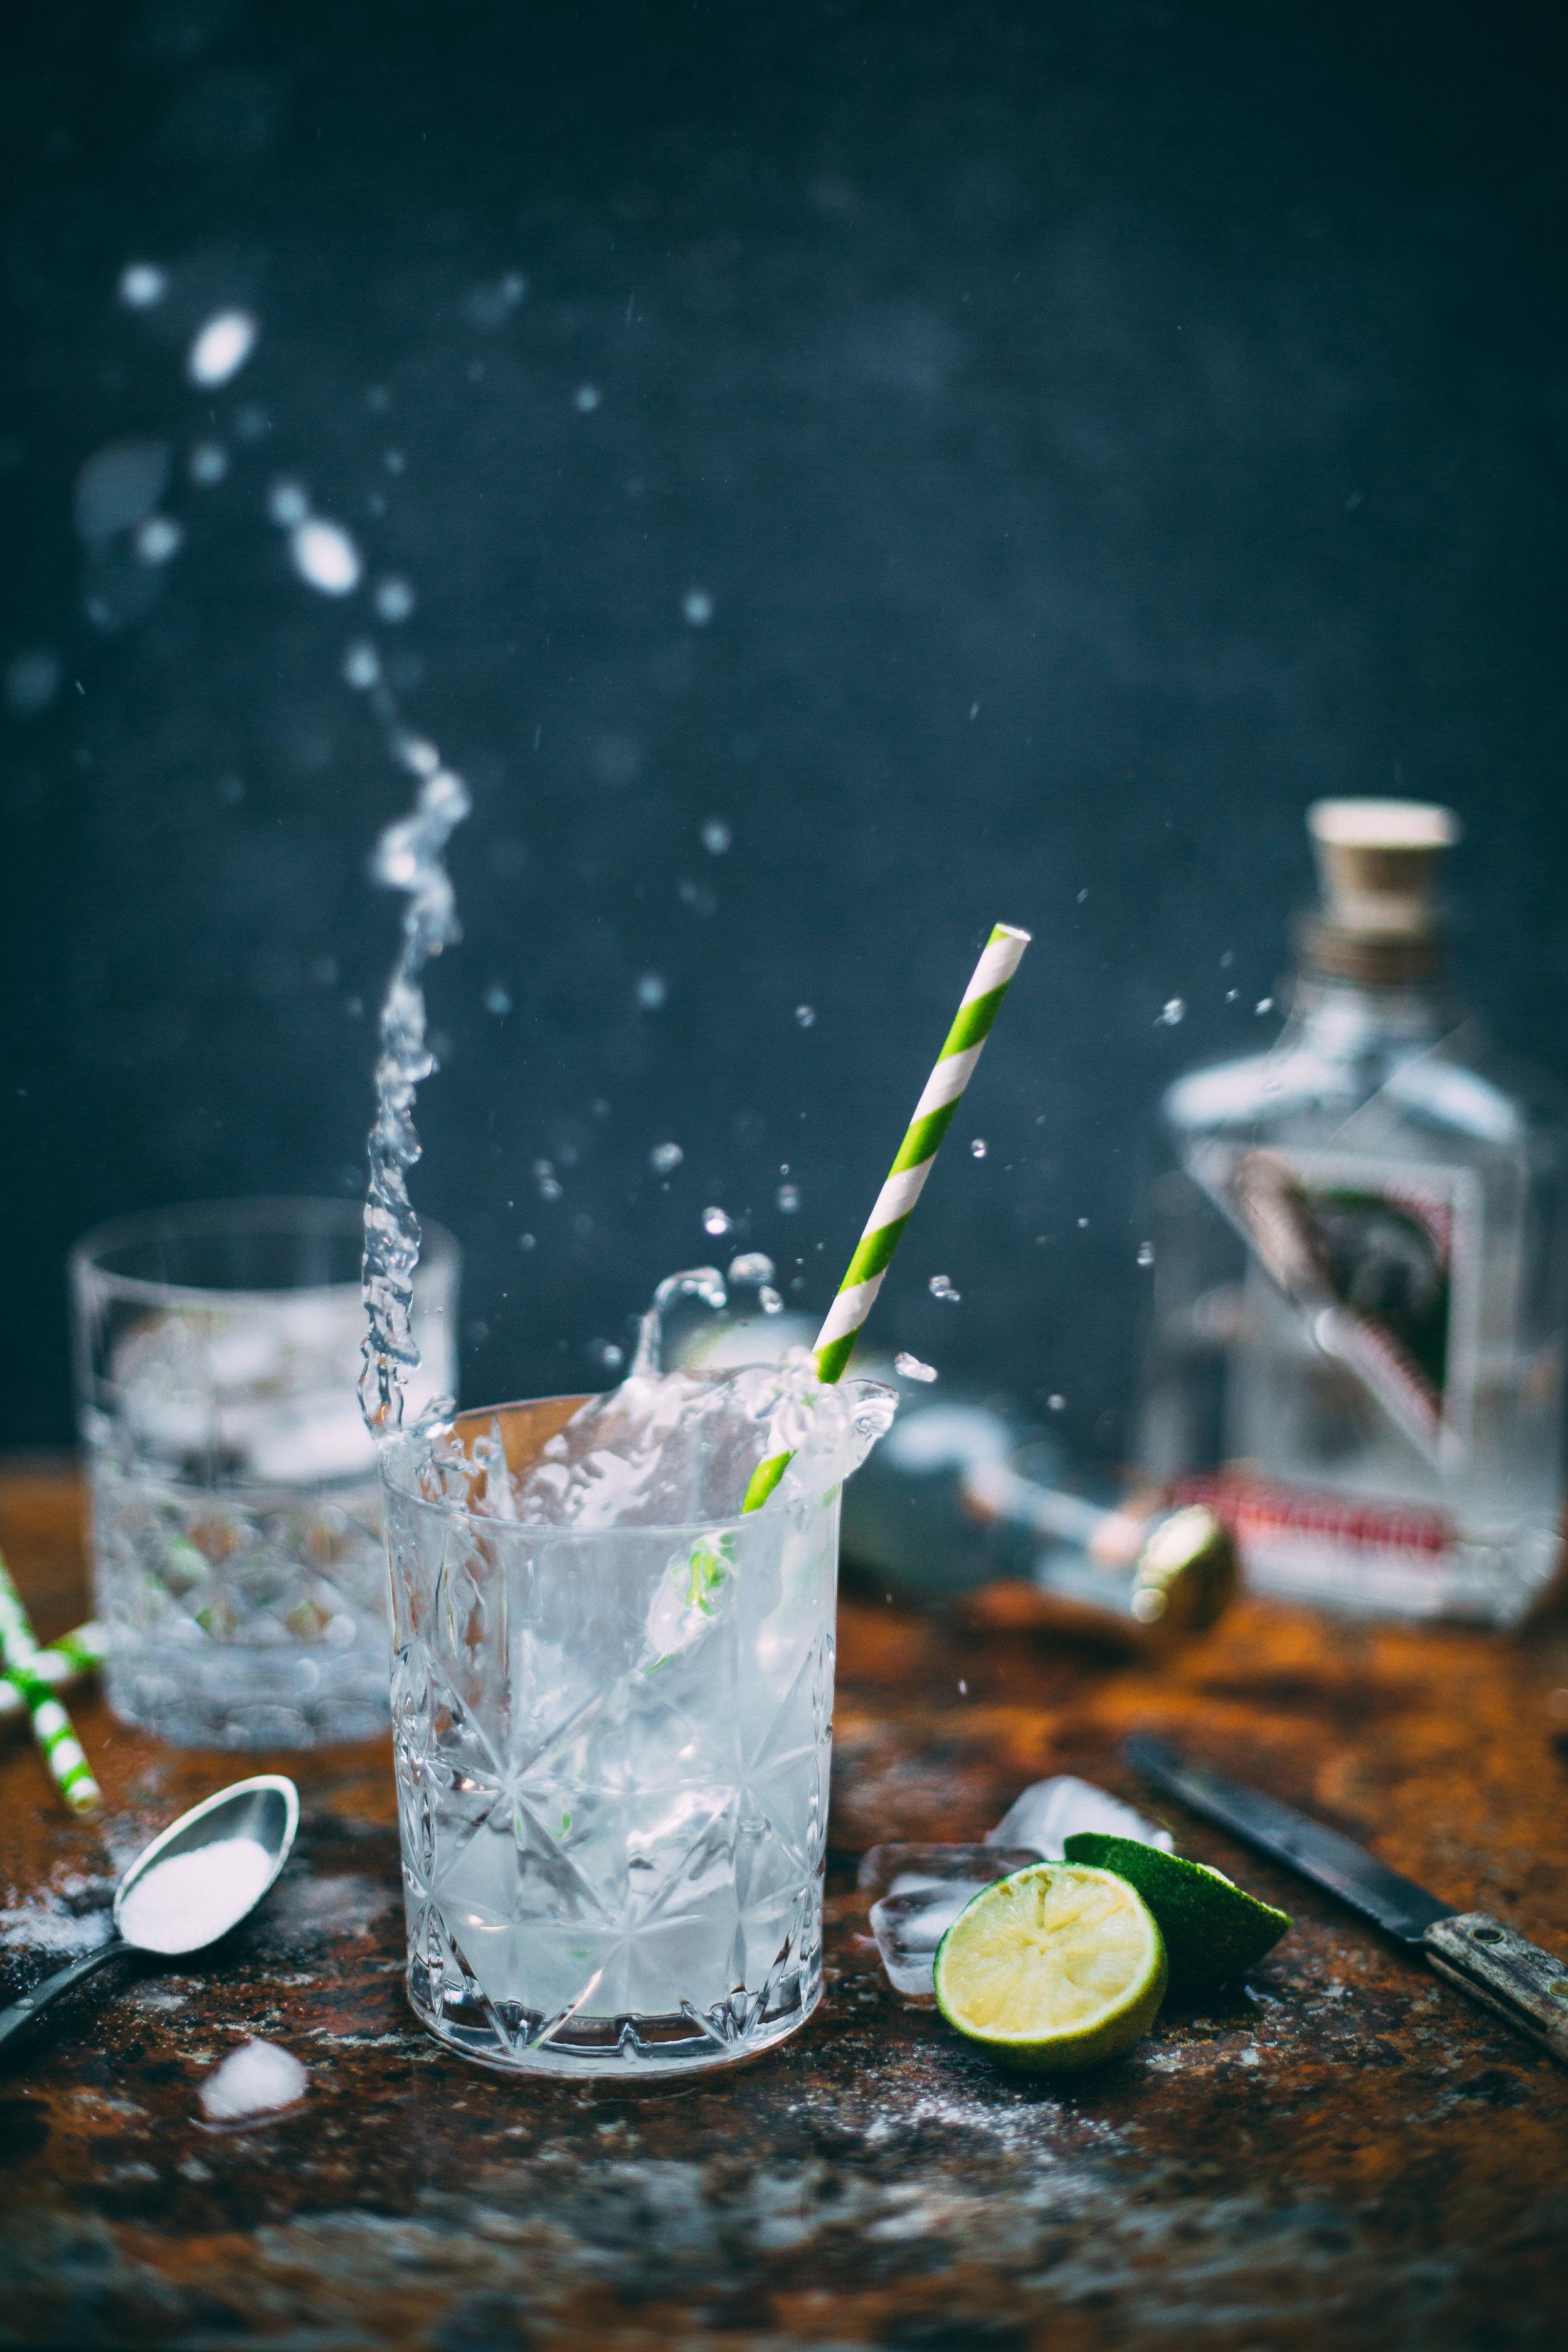 splash-down-gin-an-tonic